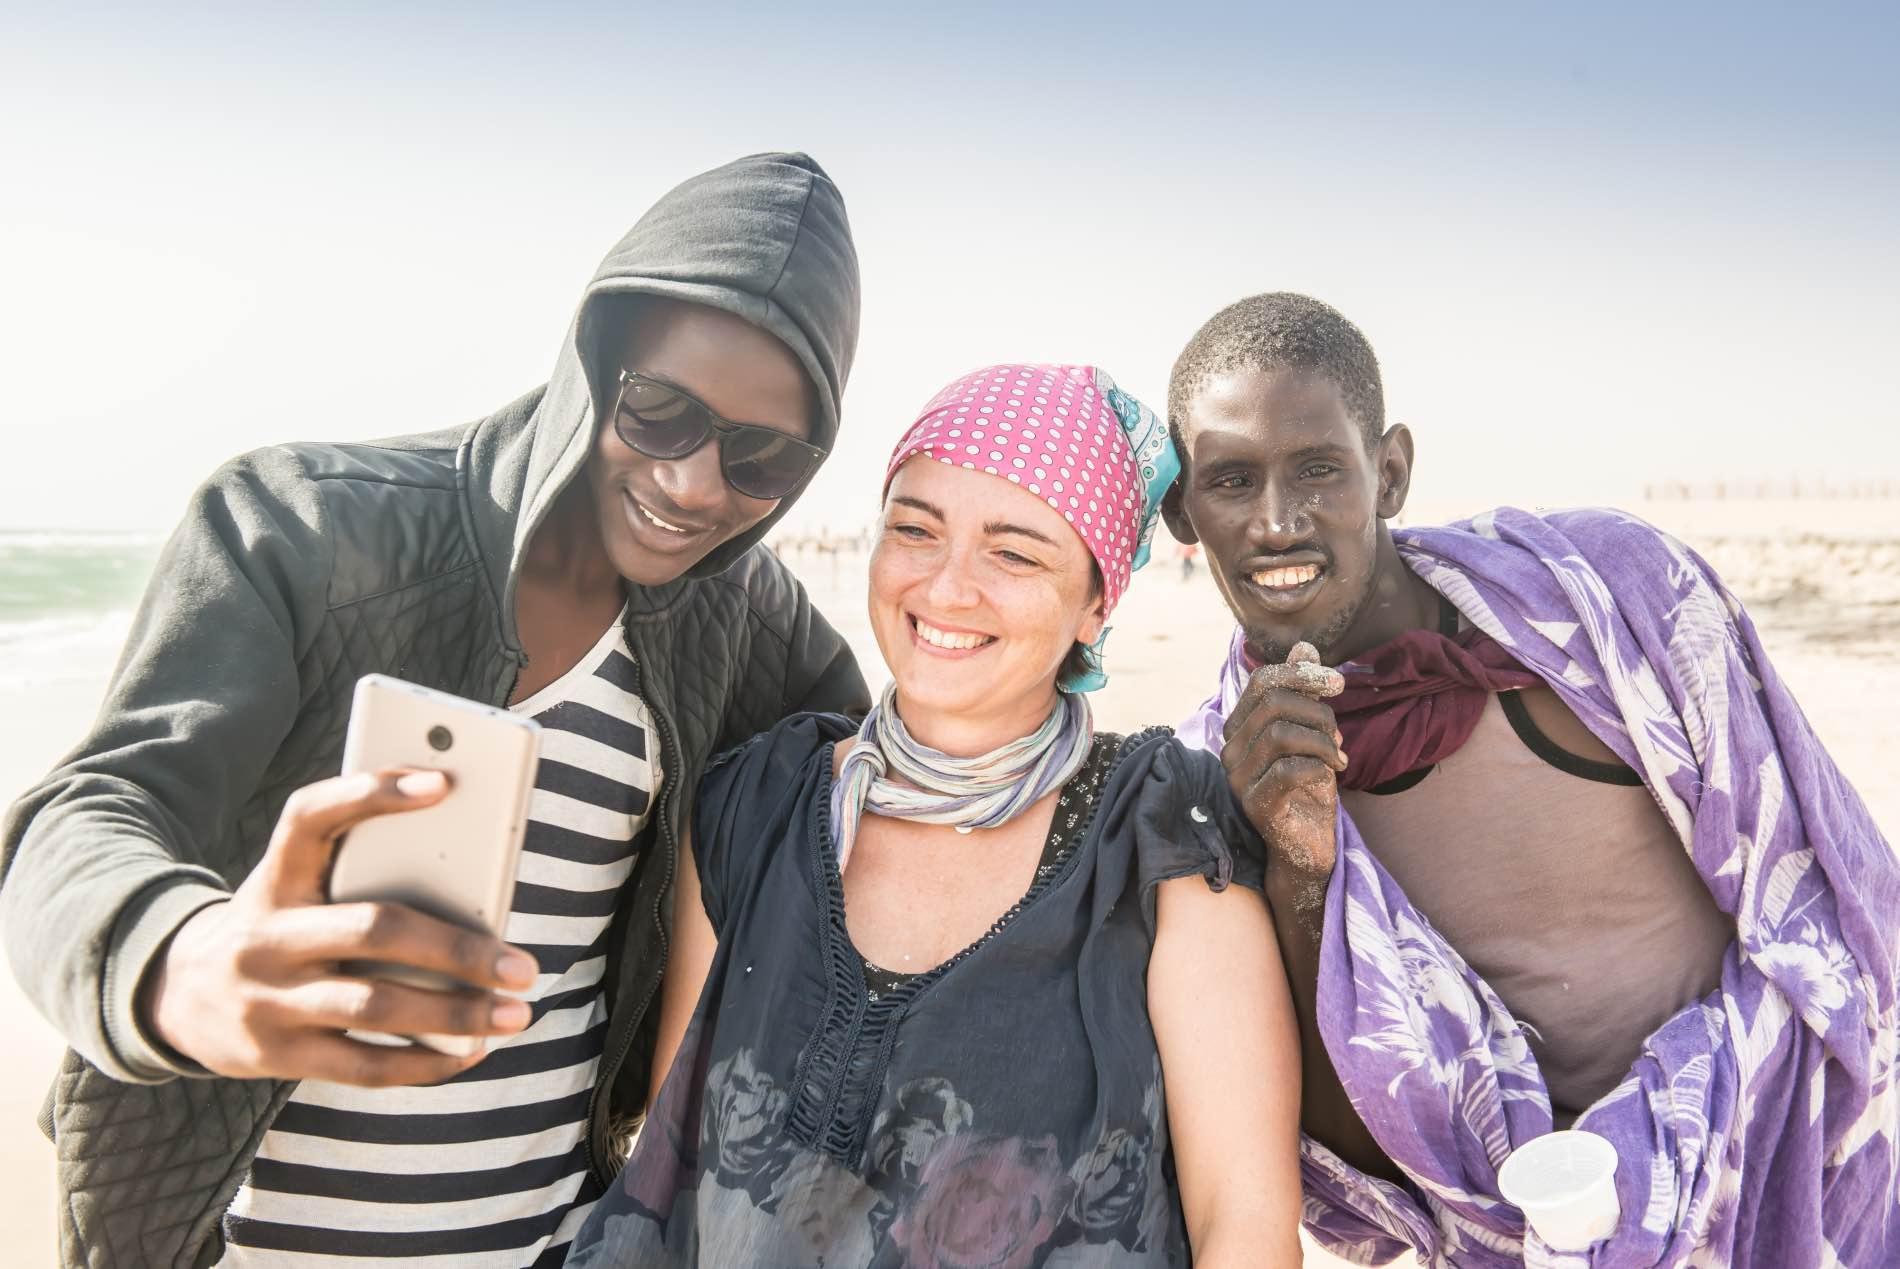 Pescatori-ragazzi-vita-mauritania